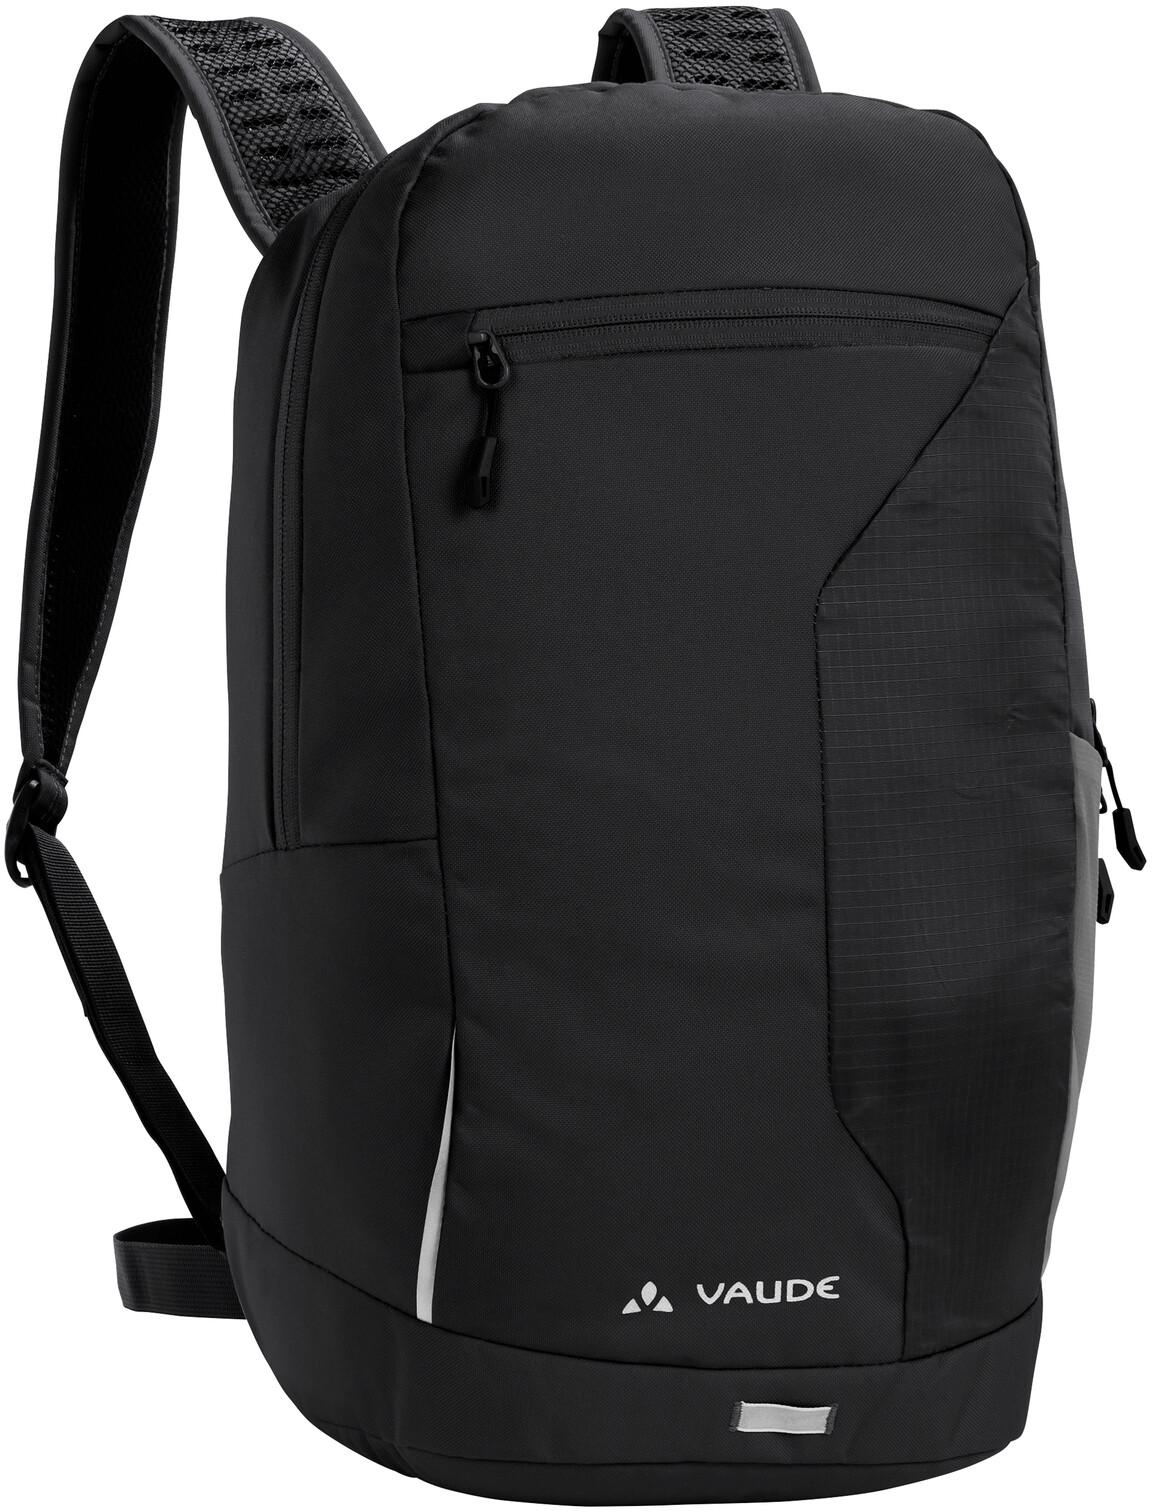 VAUDE Tecolog III 14 Rygsæk, black (2019) | Travel bags